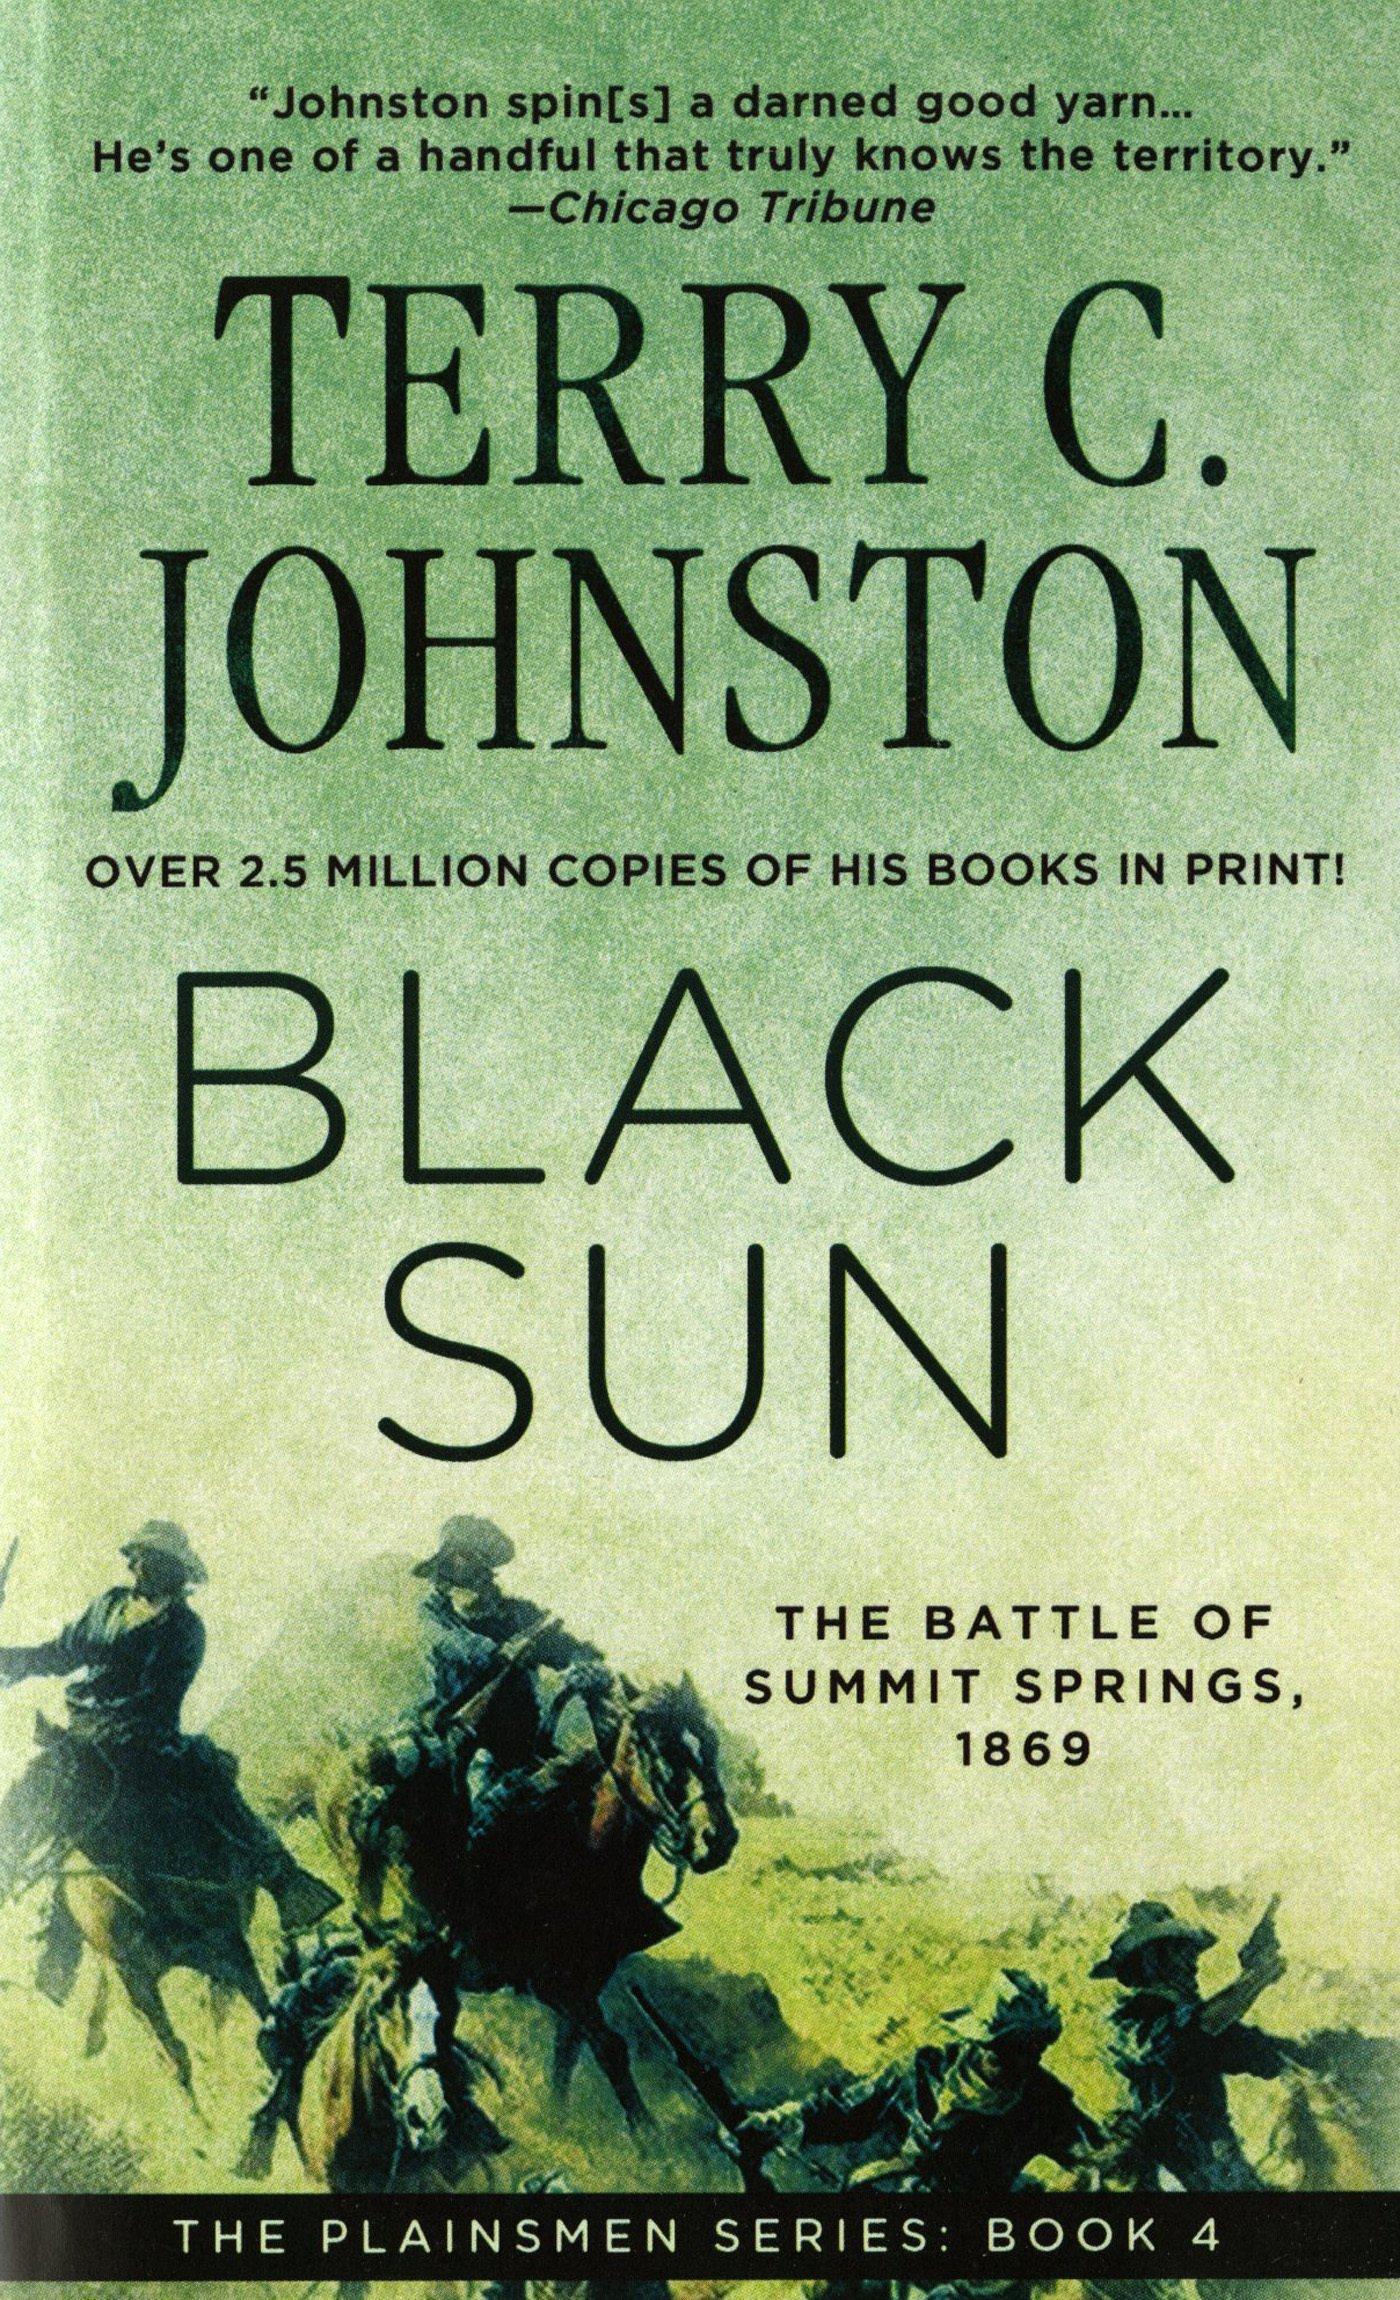 Black Sun: The Battle of Summit Springs, 1869 (The Plainsmen Series) pdf